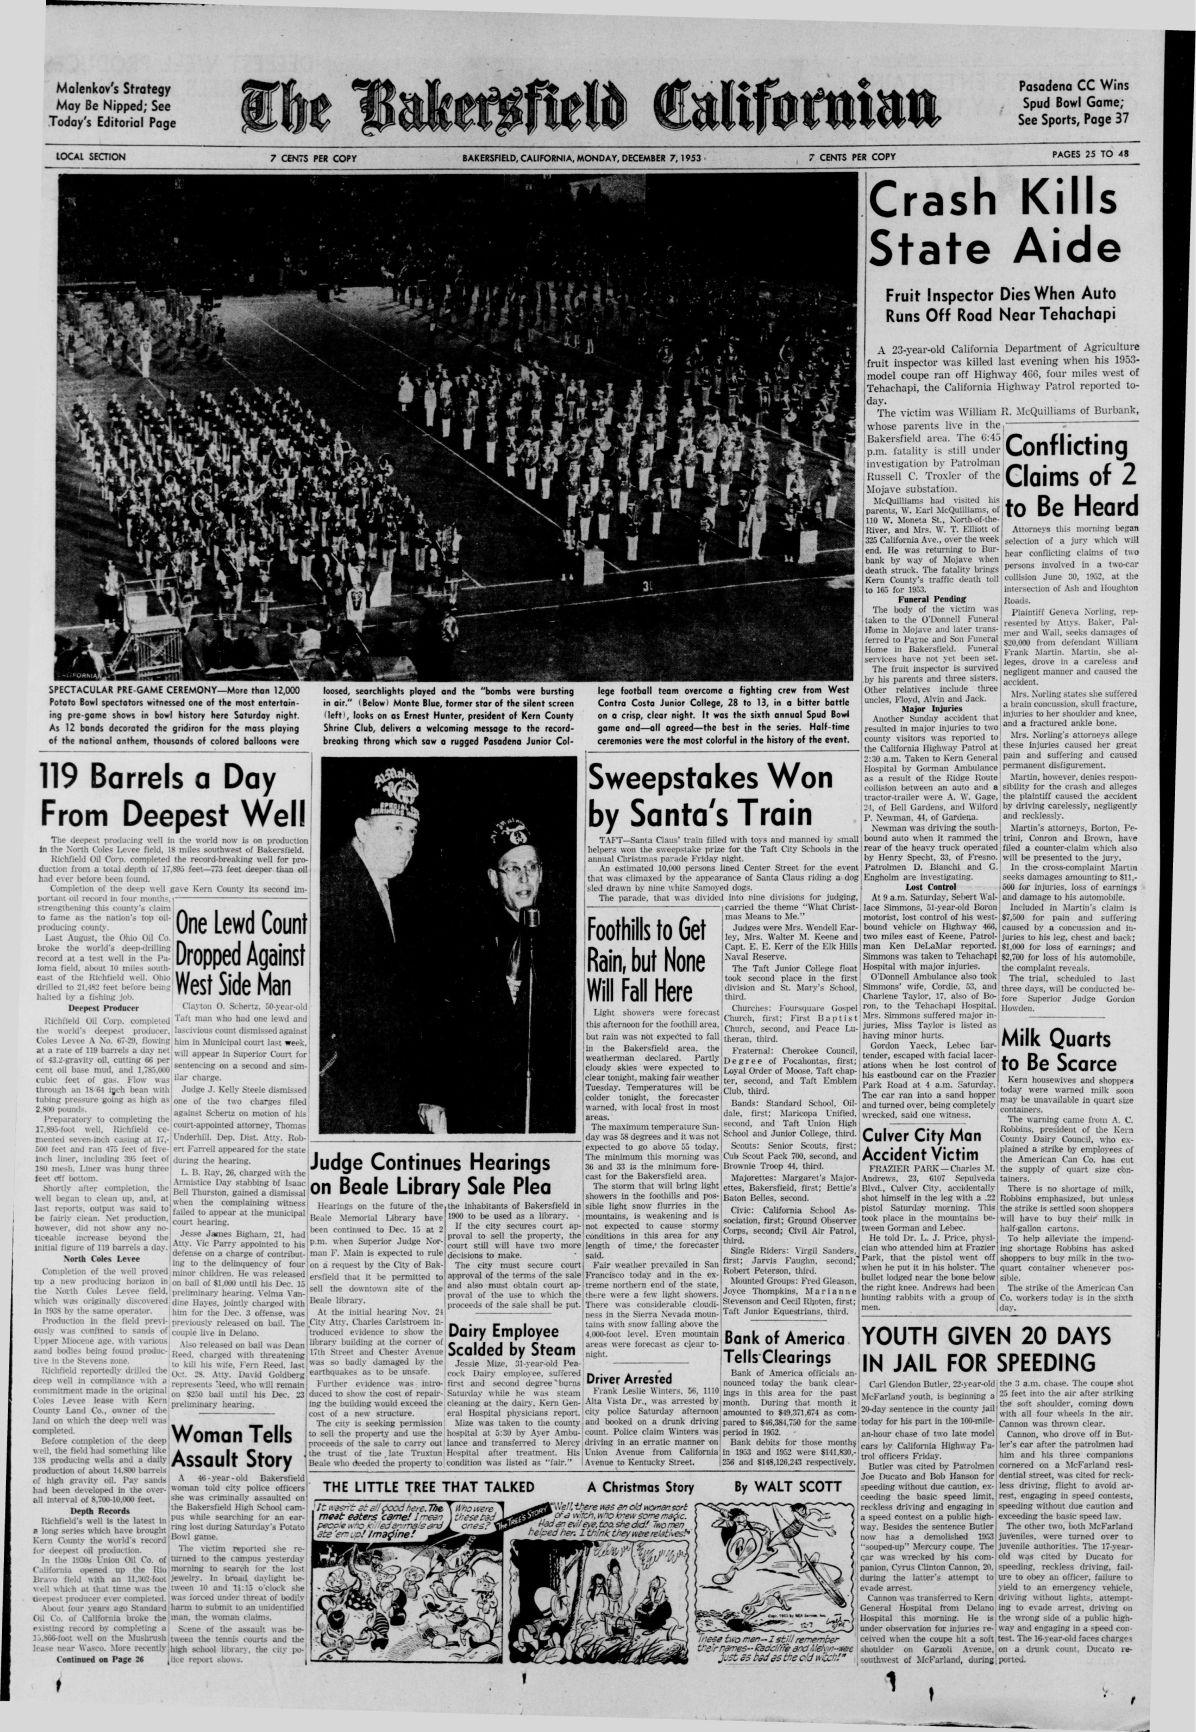 Dec, 7, 1953